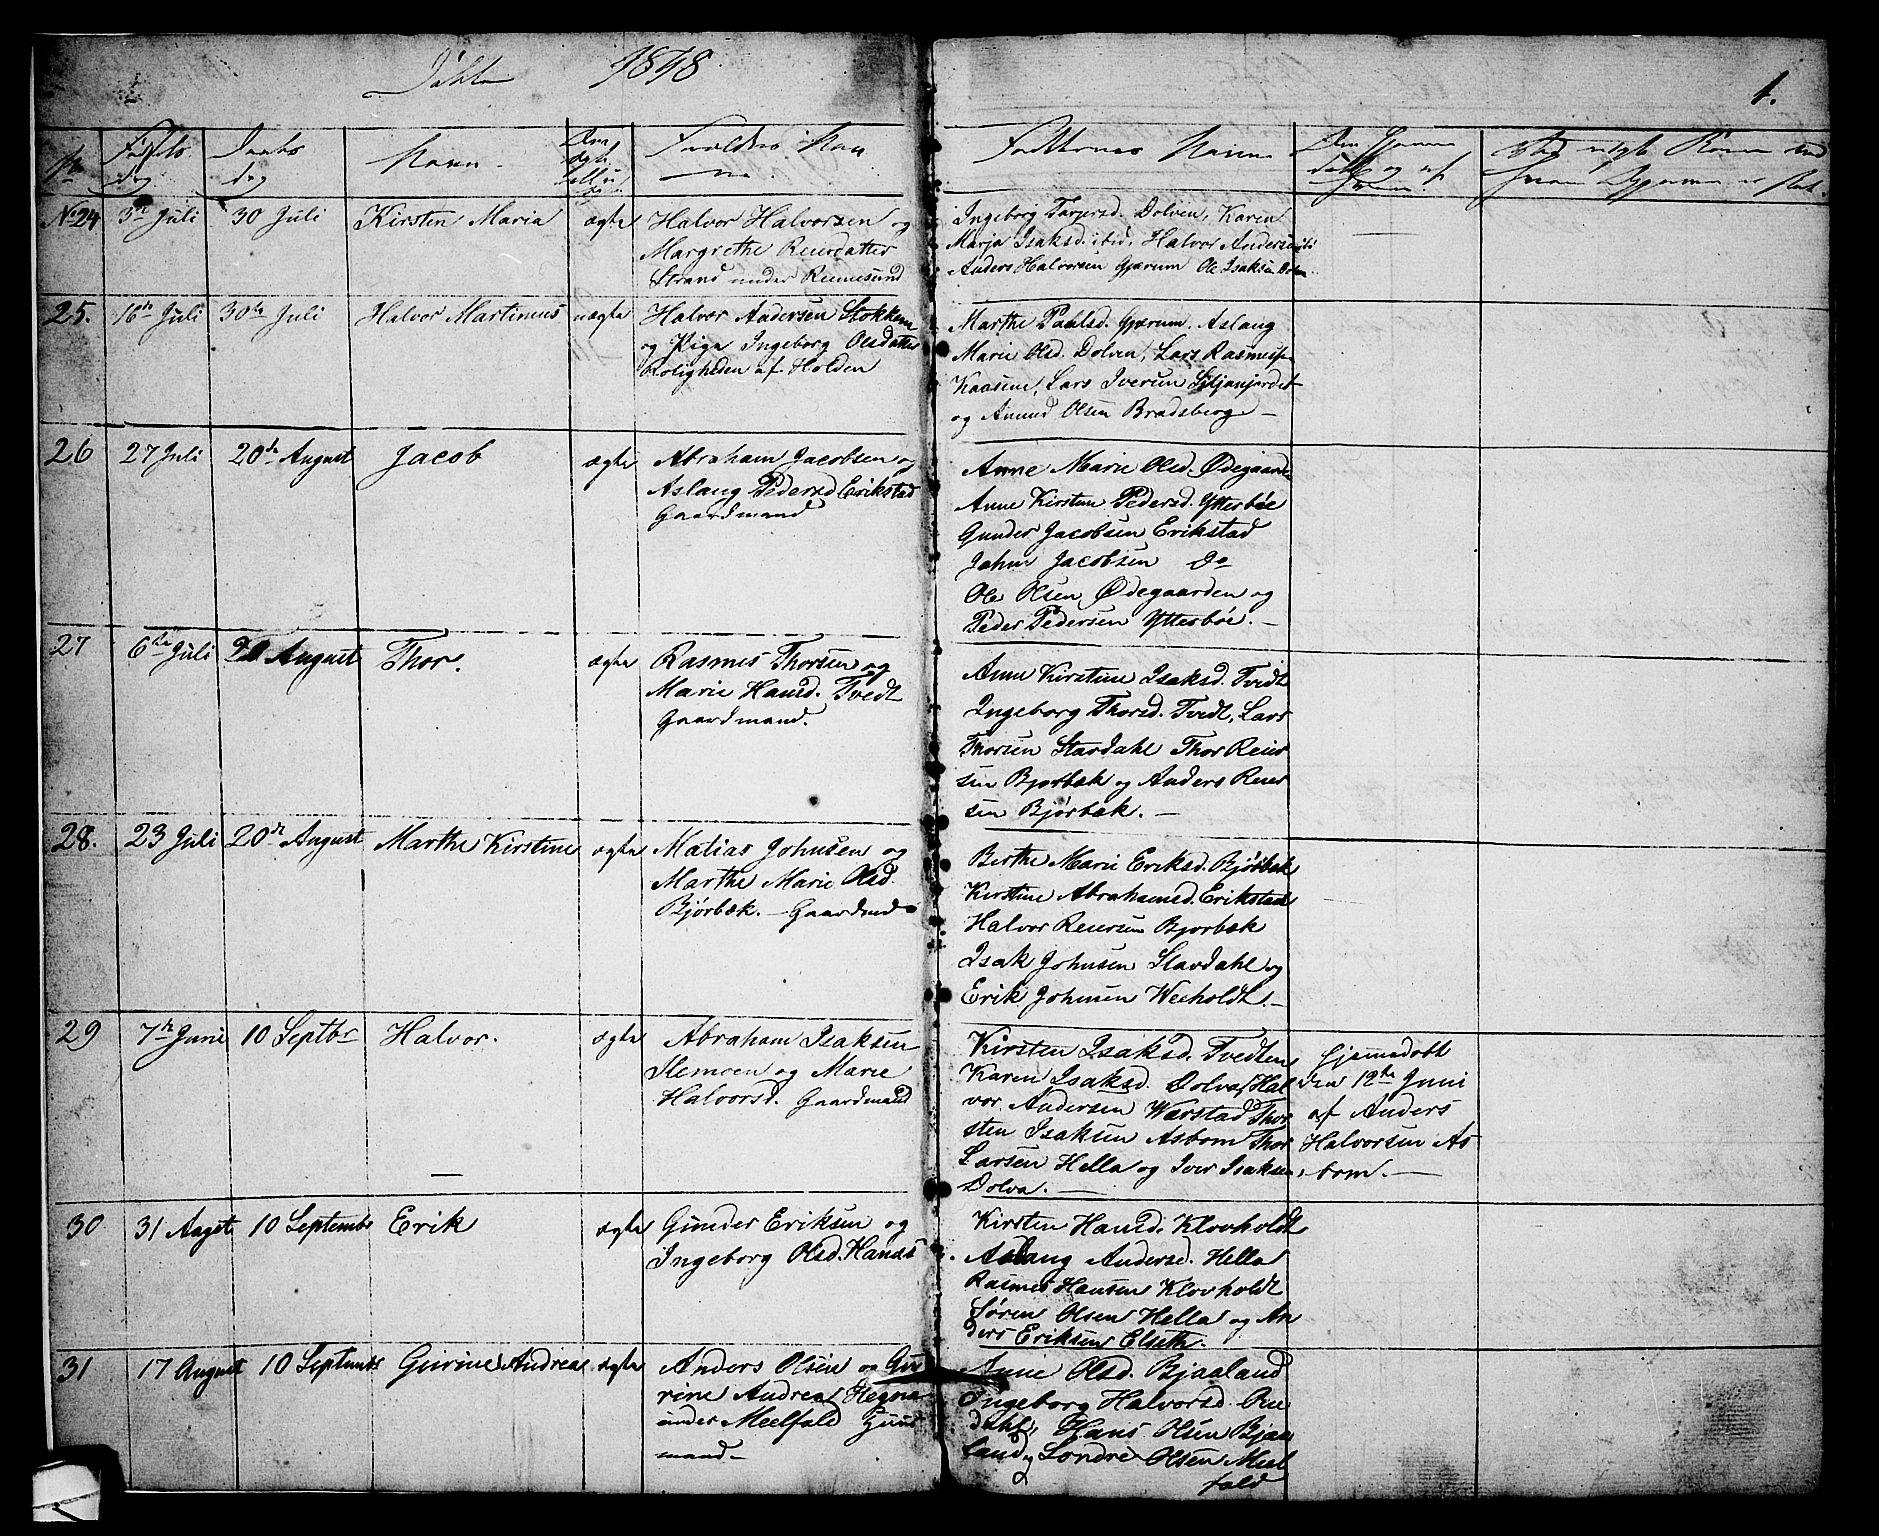 SAKO, Solum kirkebøker, G/Gb/L0001: Klokkerbok nr. II 1, 1848-1859, s. 1